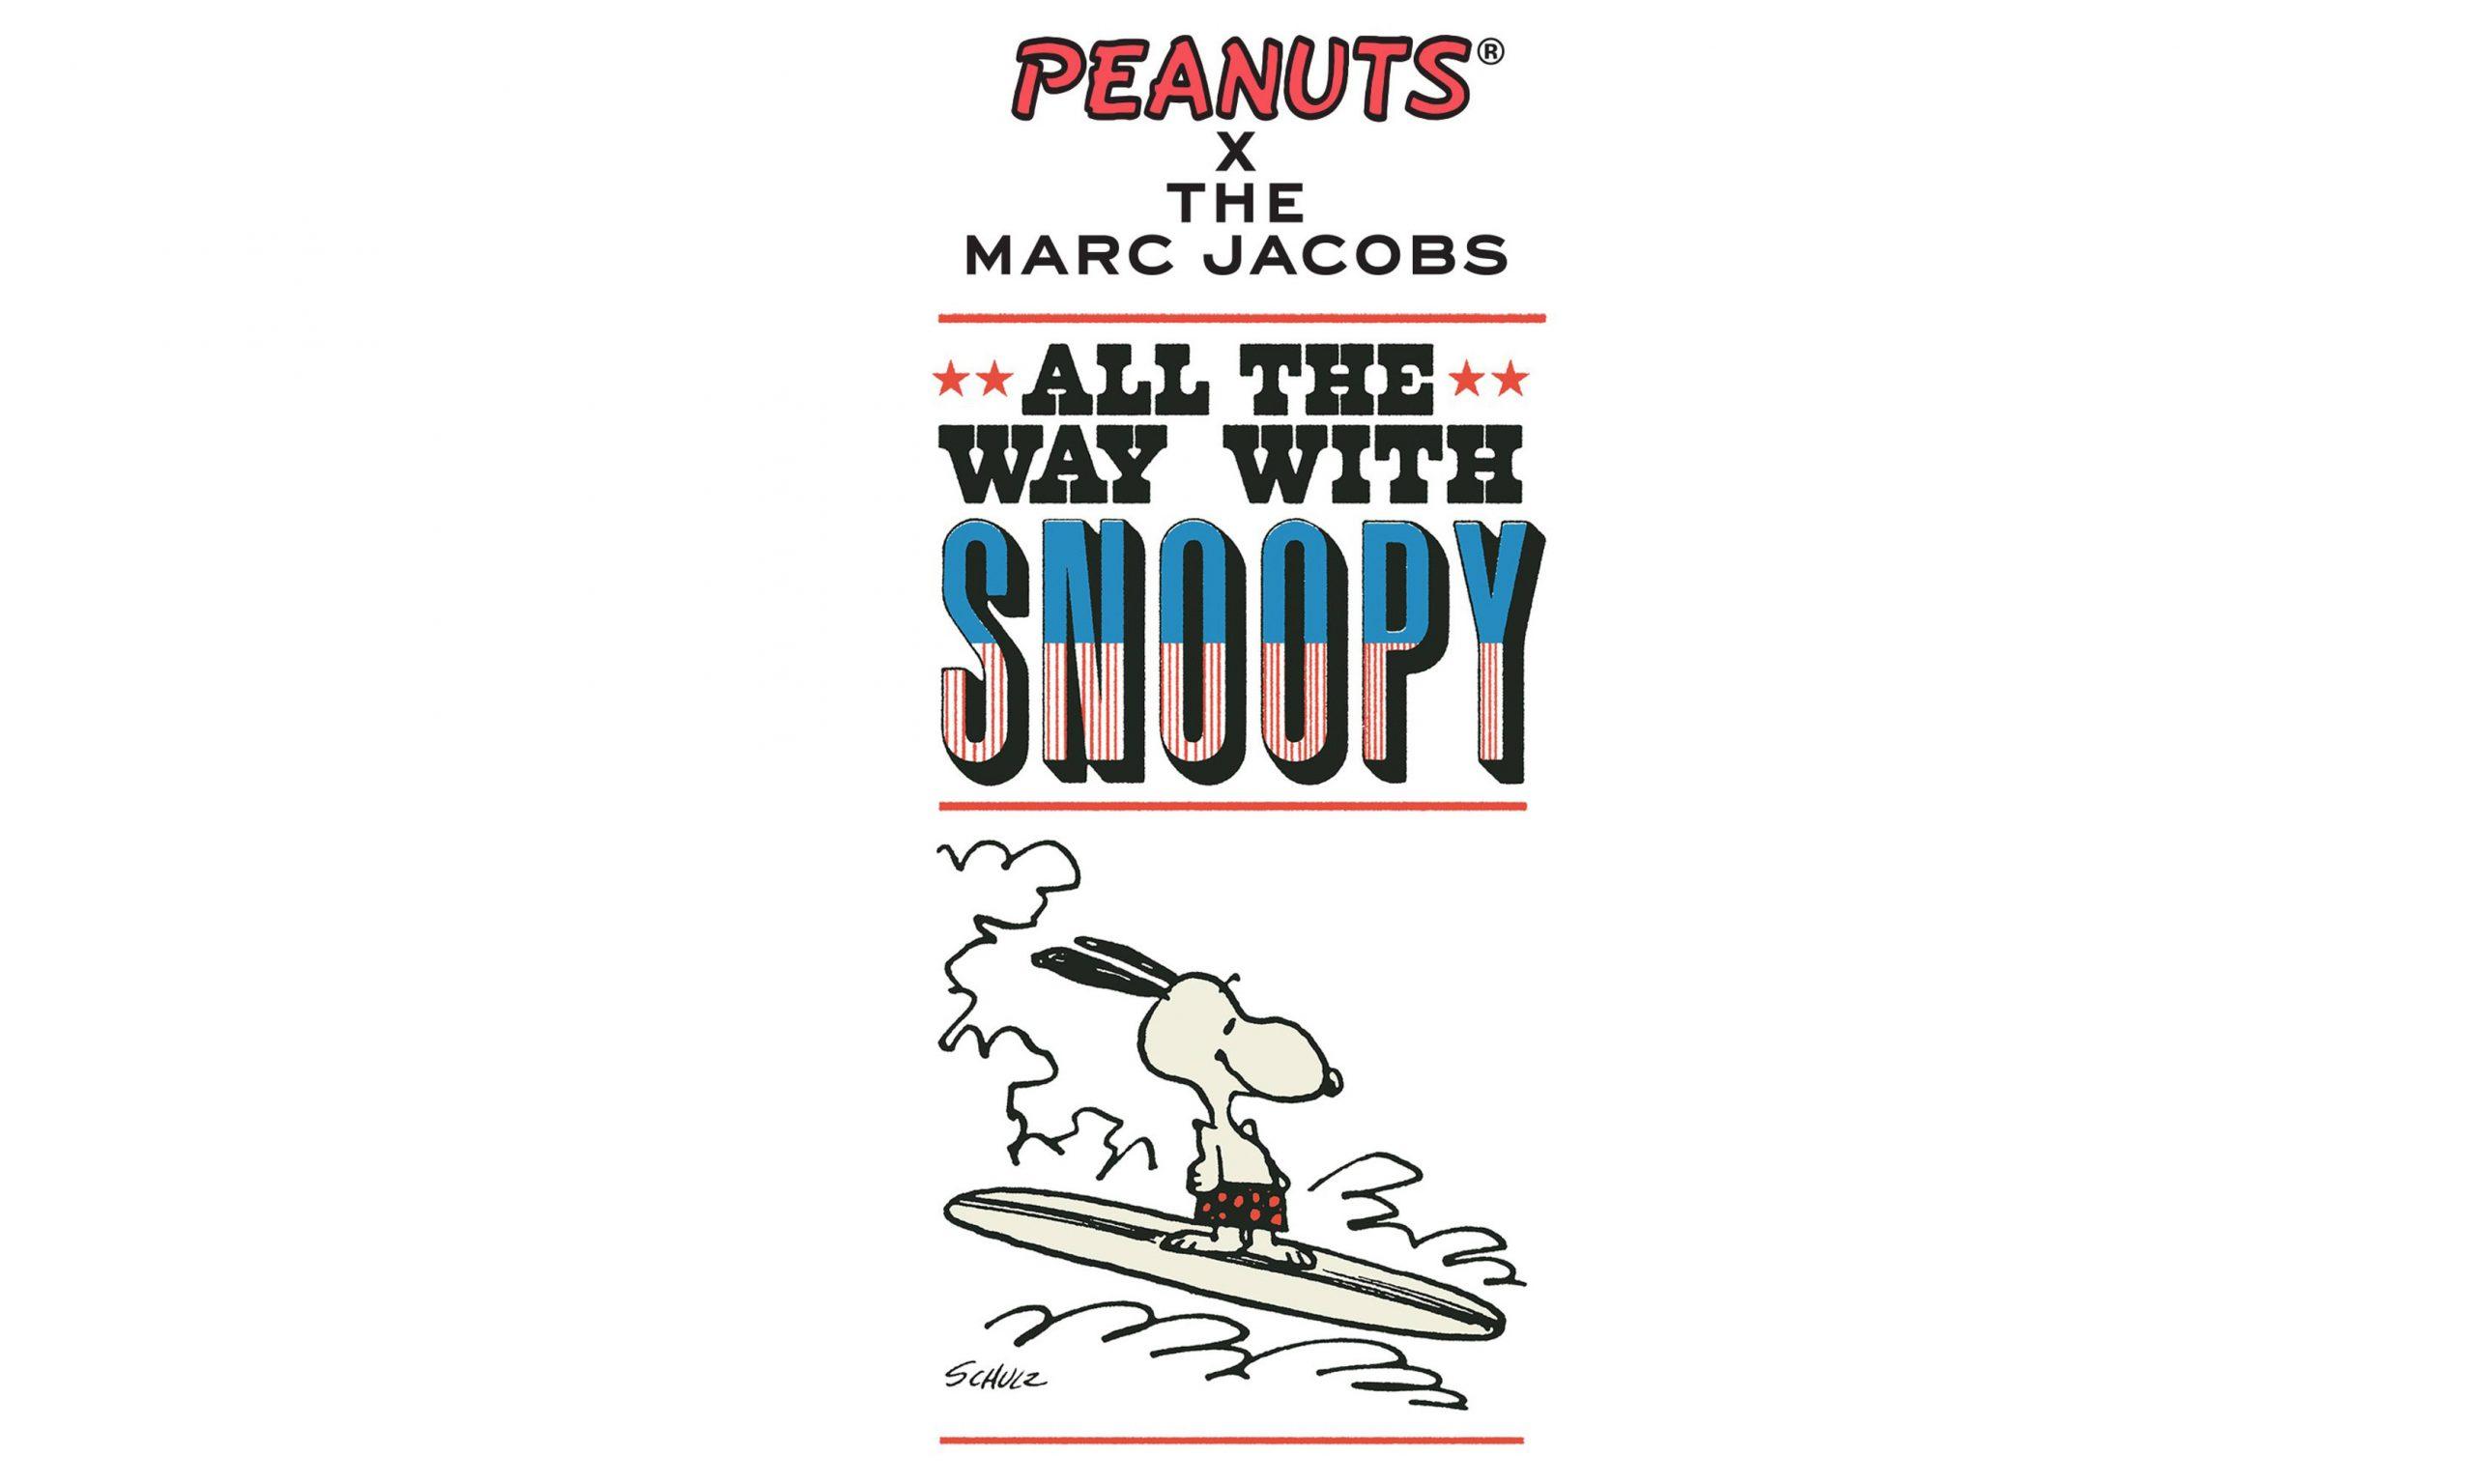 PEANUTS x Marc Jacobs 即将于日本开设 Pop-Up Store